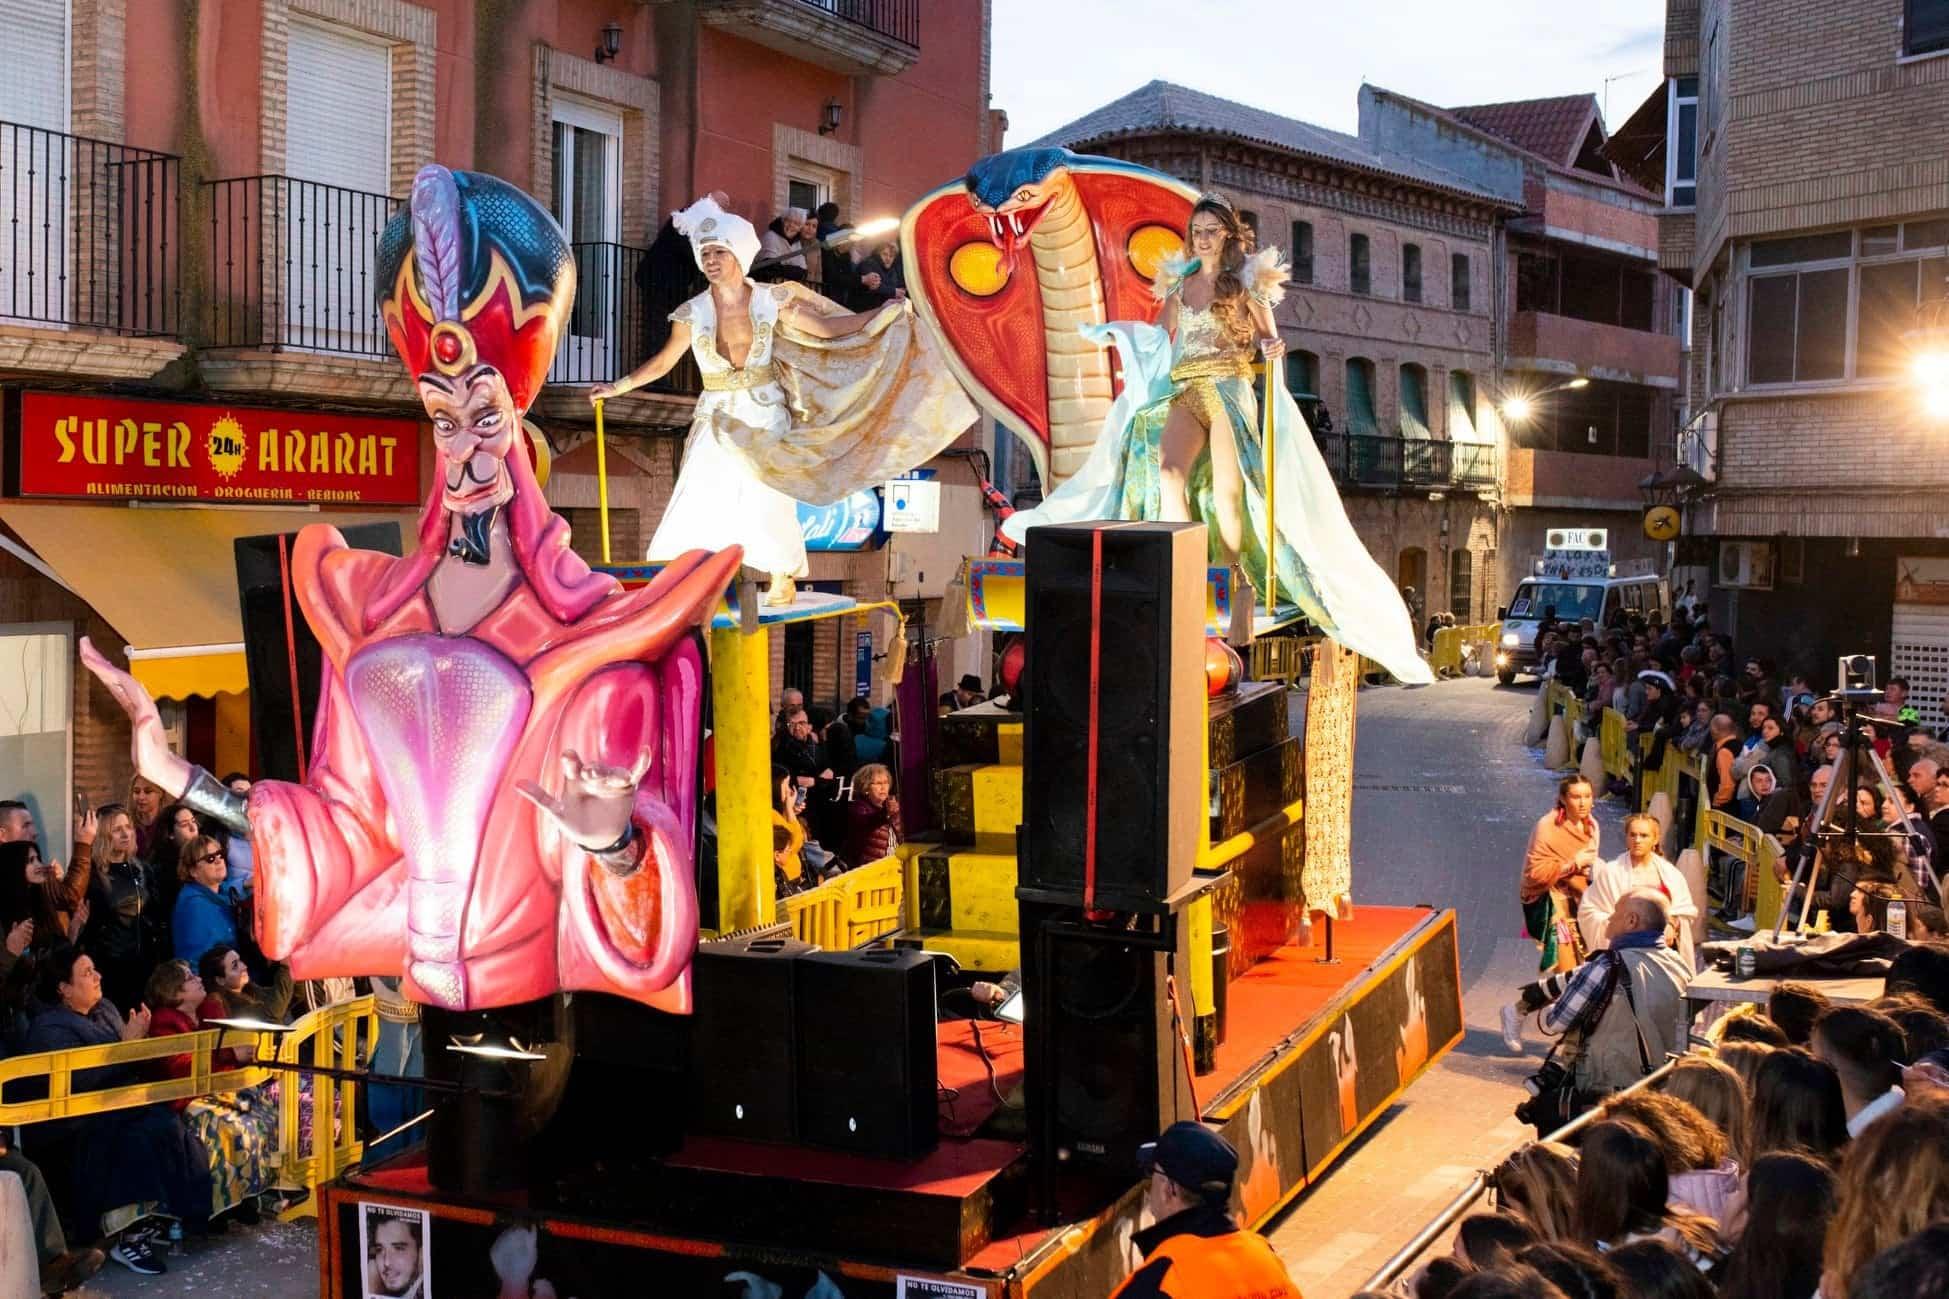 Carnaval de herencia 2020 ofertorio 120 - Selección de fotografías del Ofertorio del Carnaval de Herencia